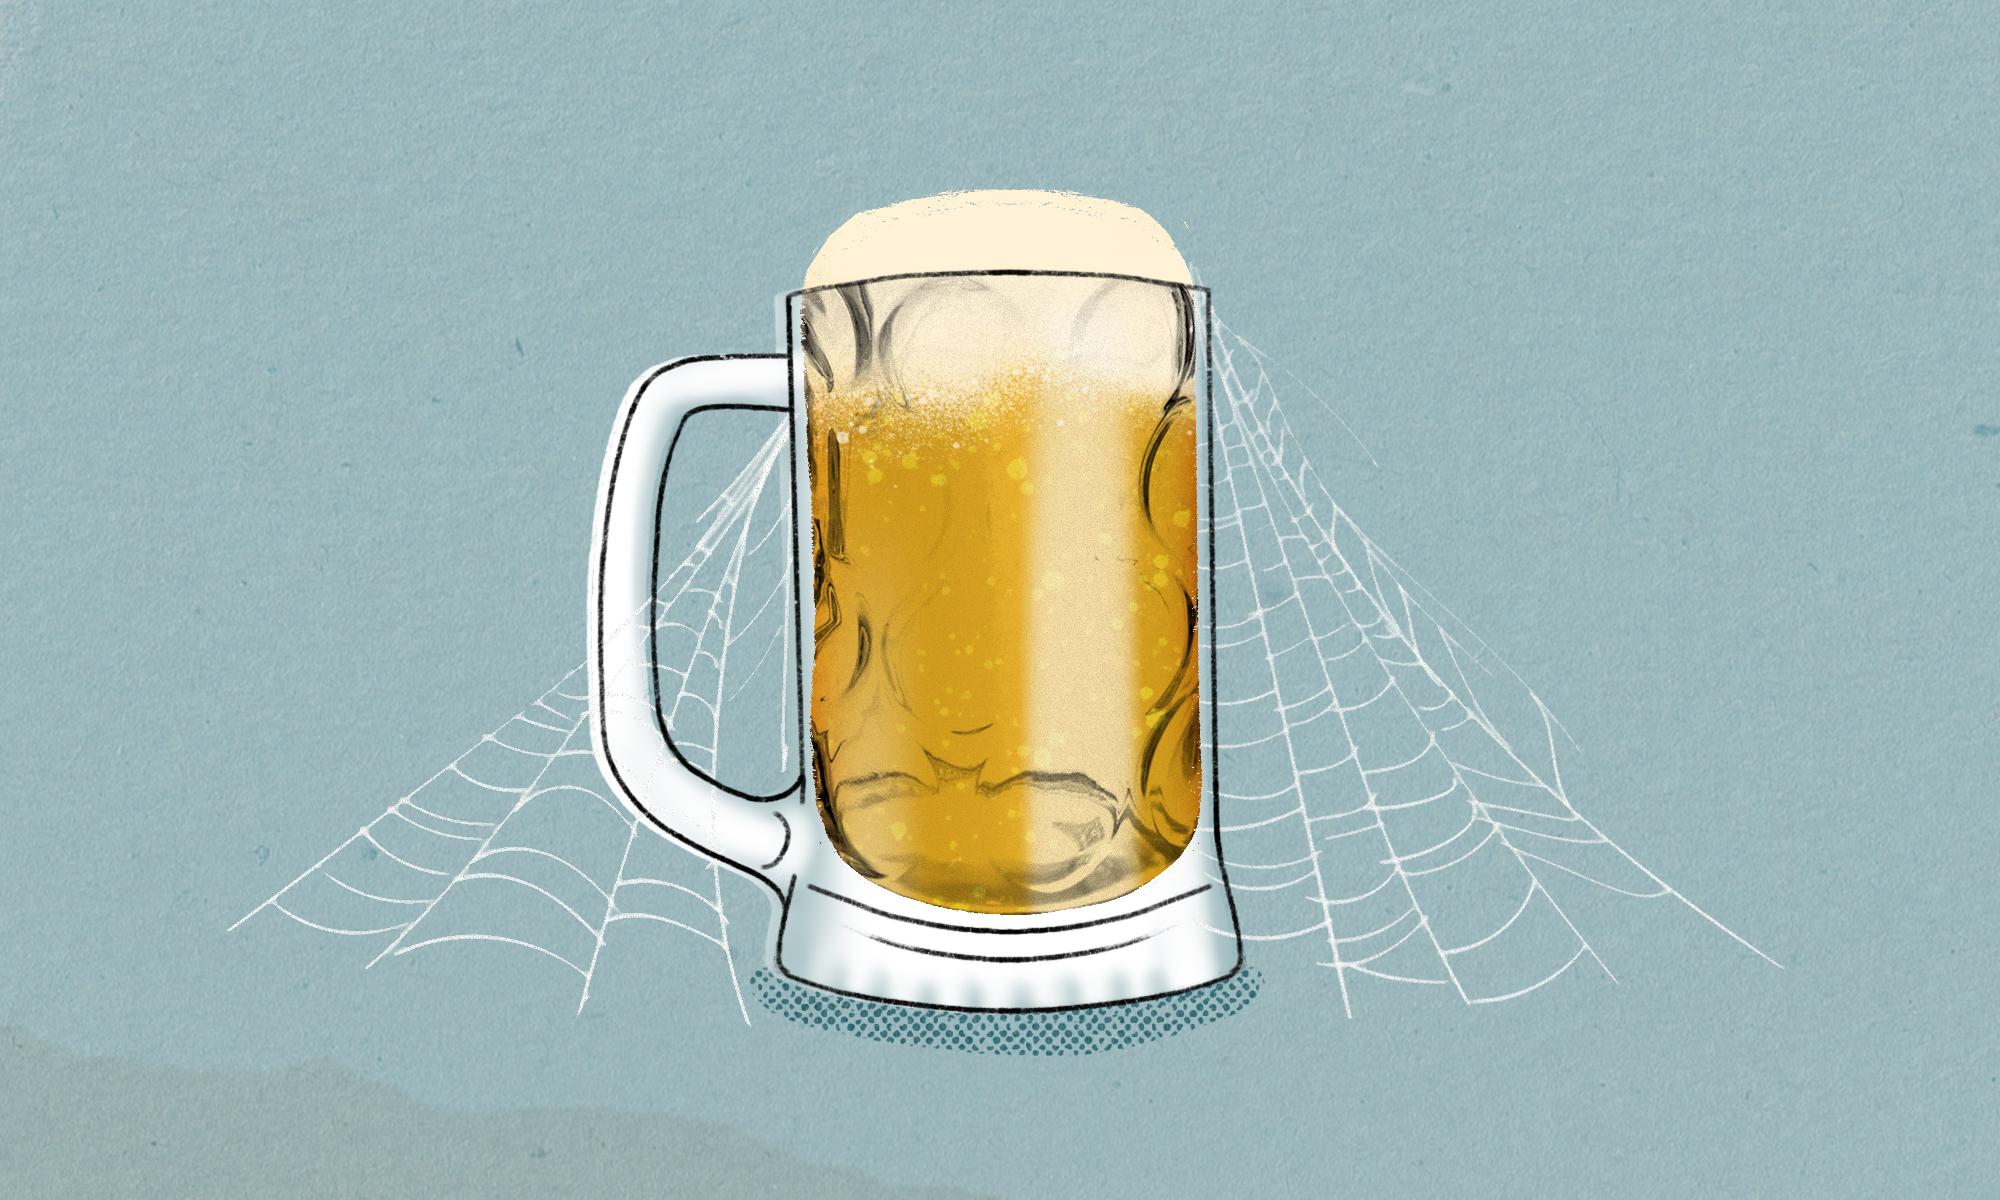 illustration of full beer mug with cobwebs draped over it